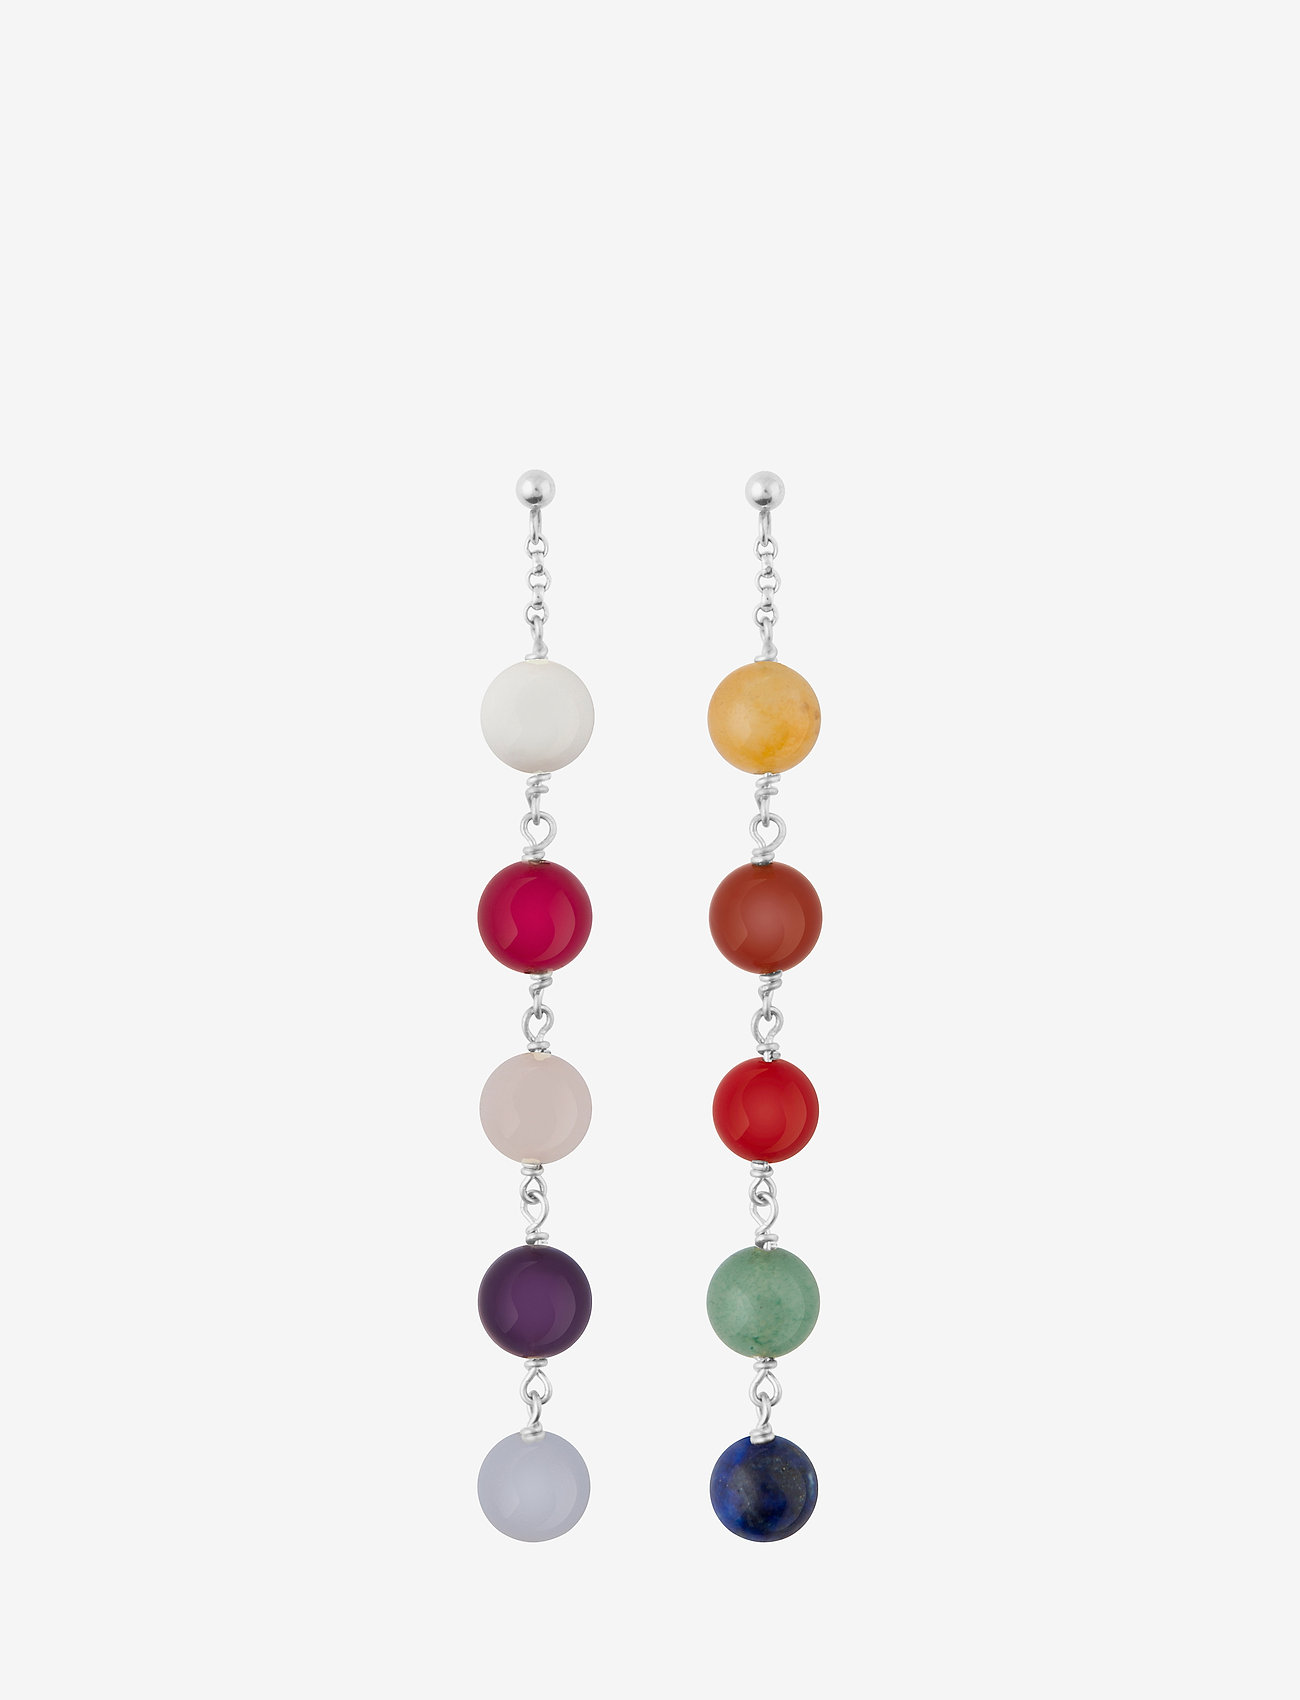 SOPHIE by SOPHIE - Childhood earrings - statement-øreringe - silver - 1